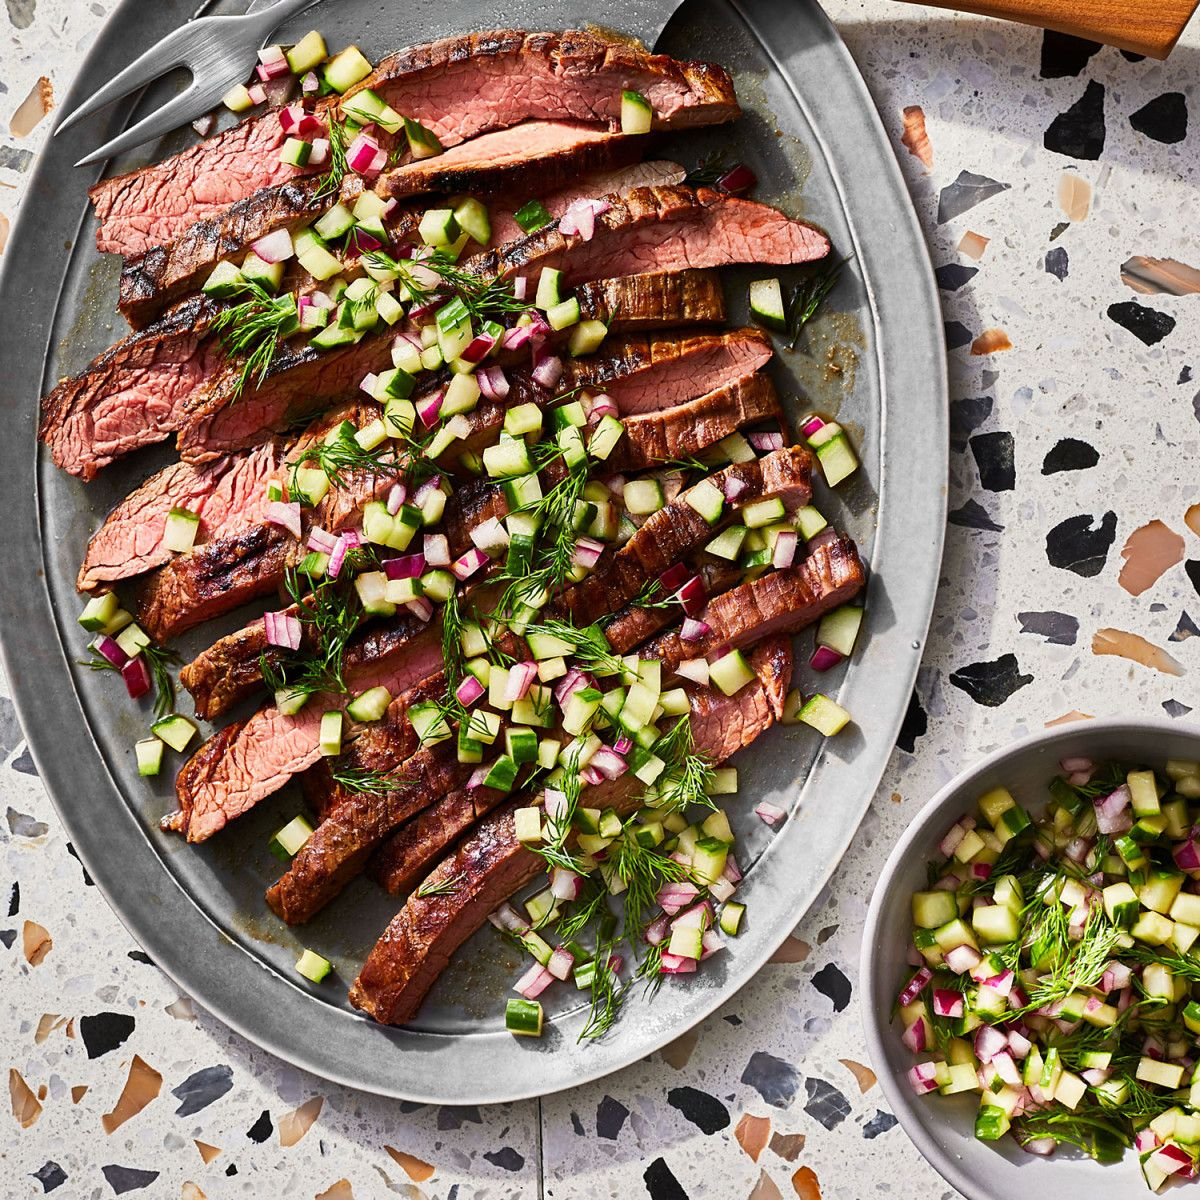 5 Ingredient Steak Cucumber Salsa Dinner Recipe Summer Grilling Recipes Easy Chicken Dinner Recipes Steak Dinner